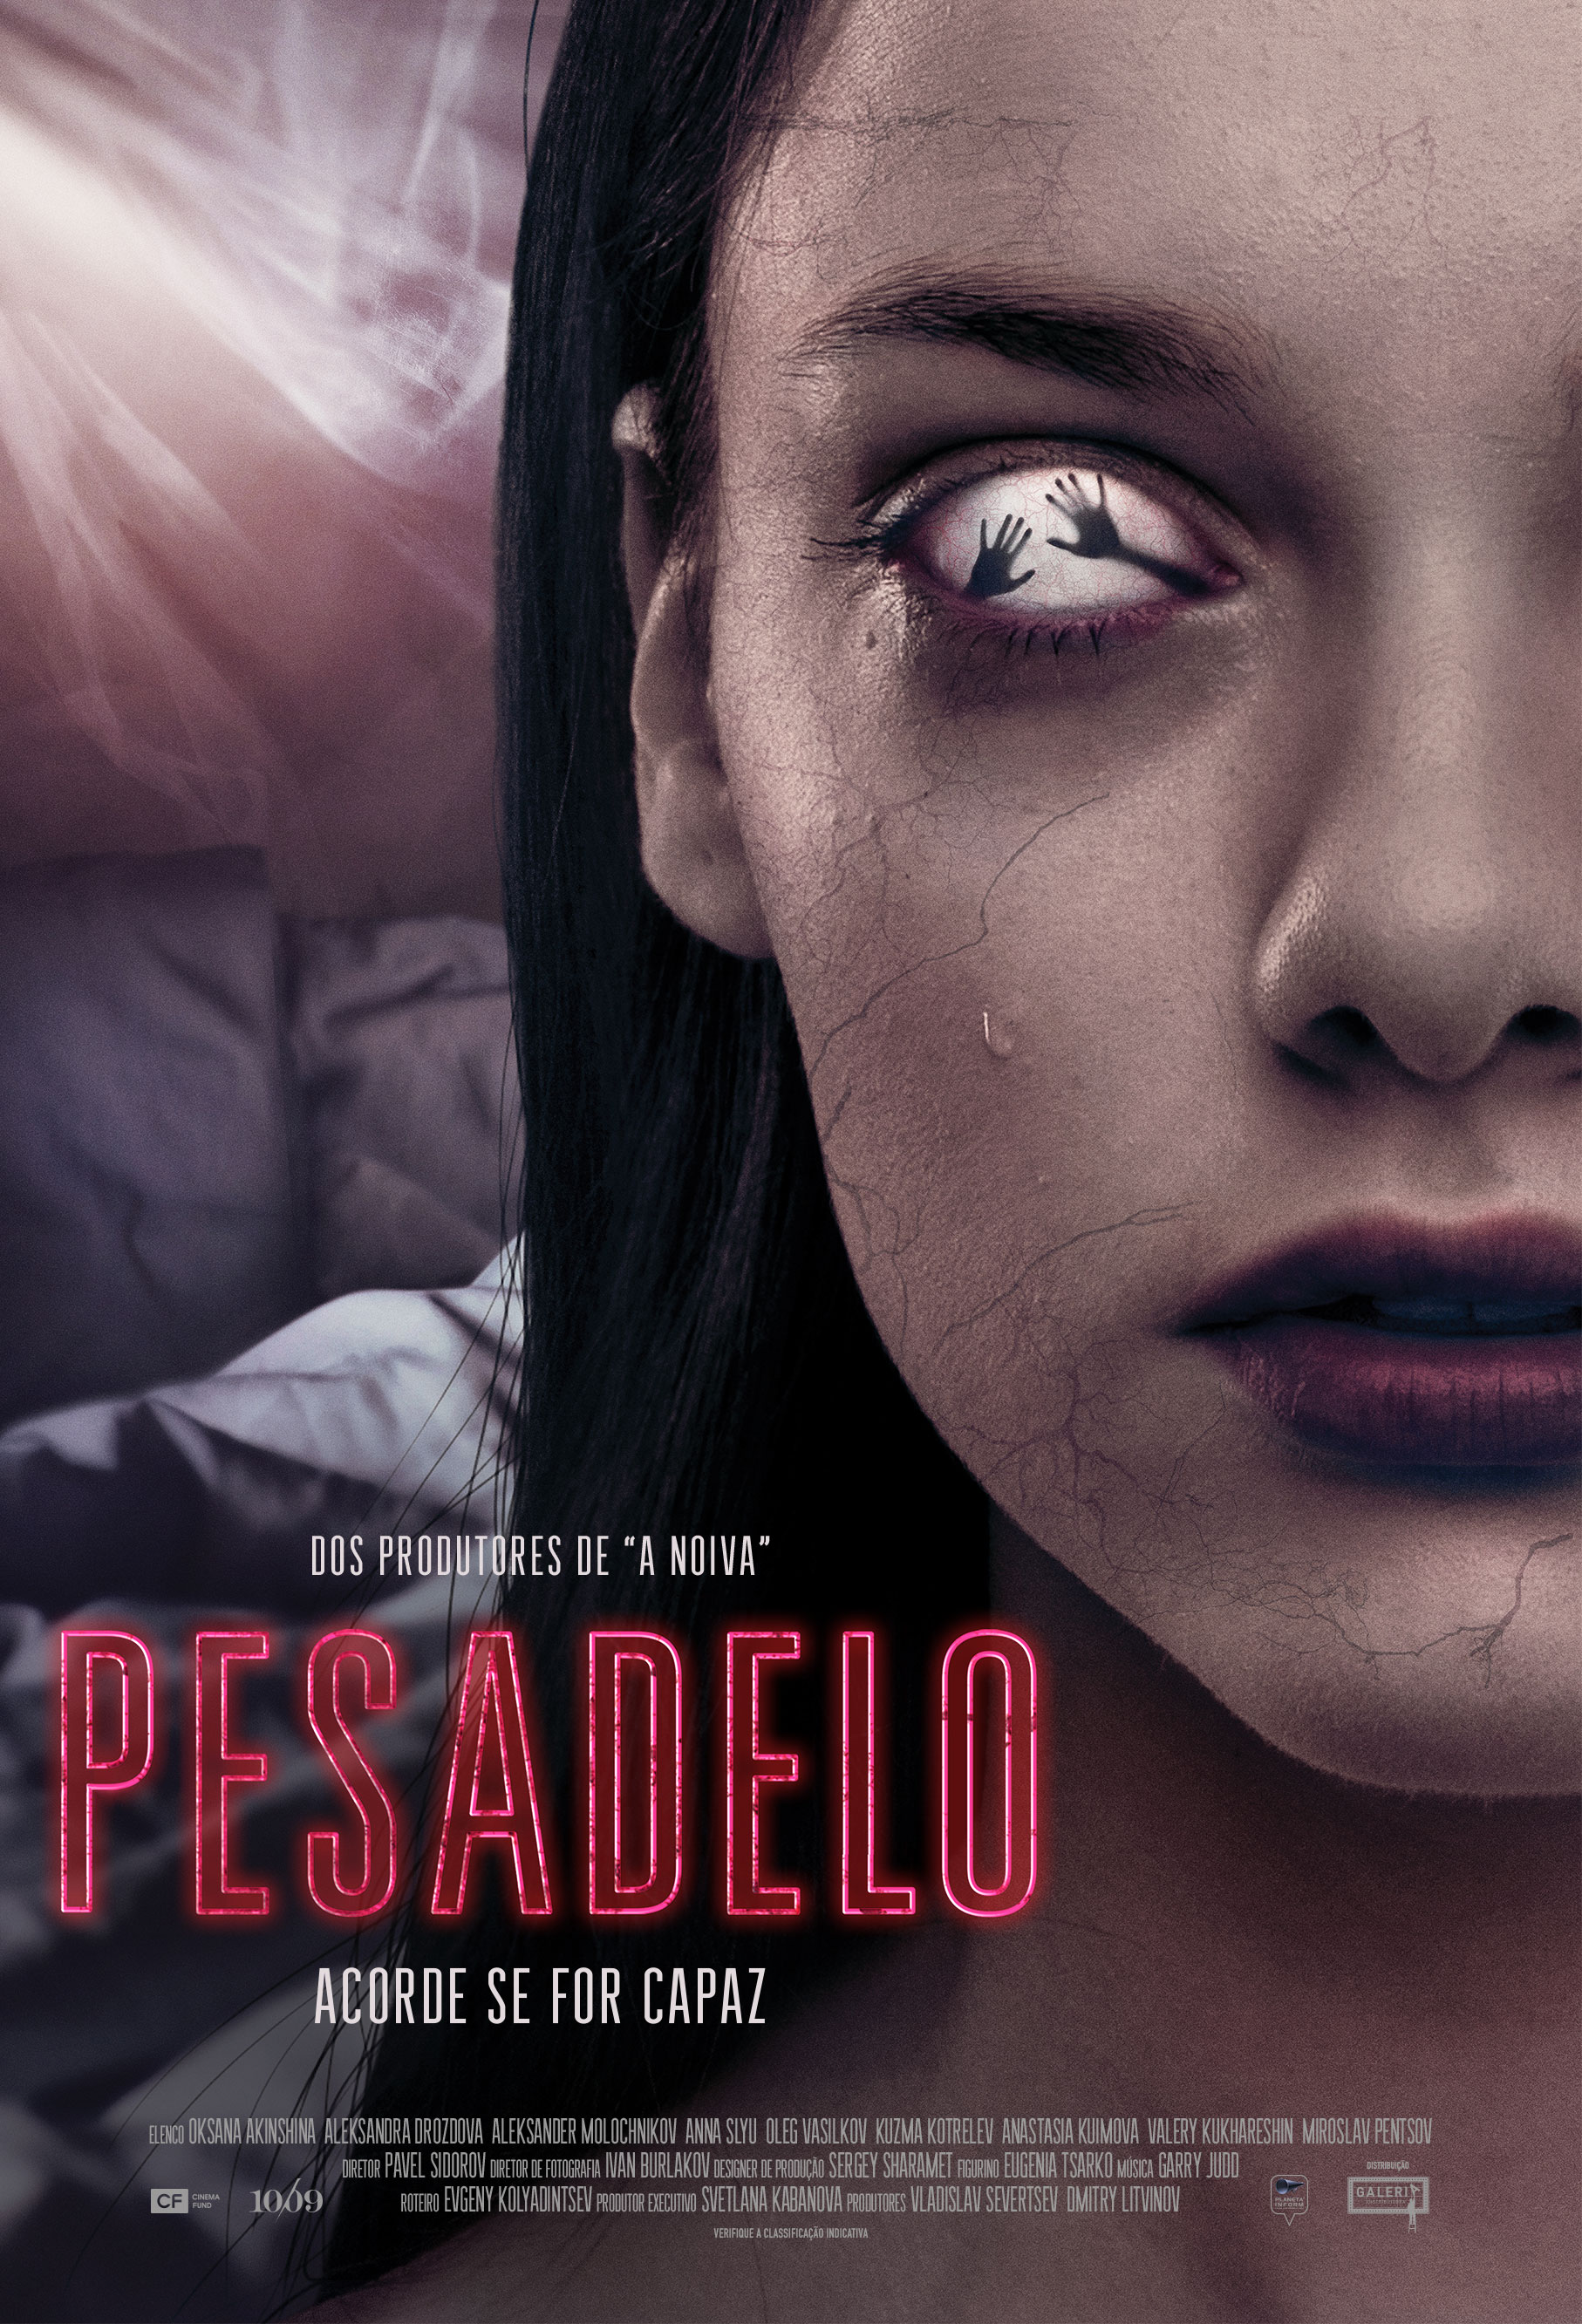 Pesadelo - Filme 2019 - AdoroCinema